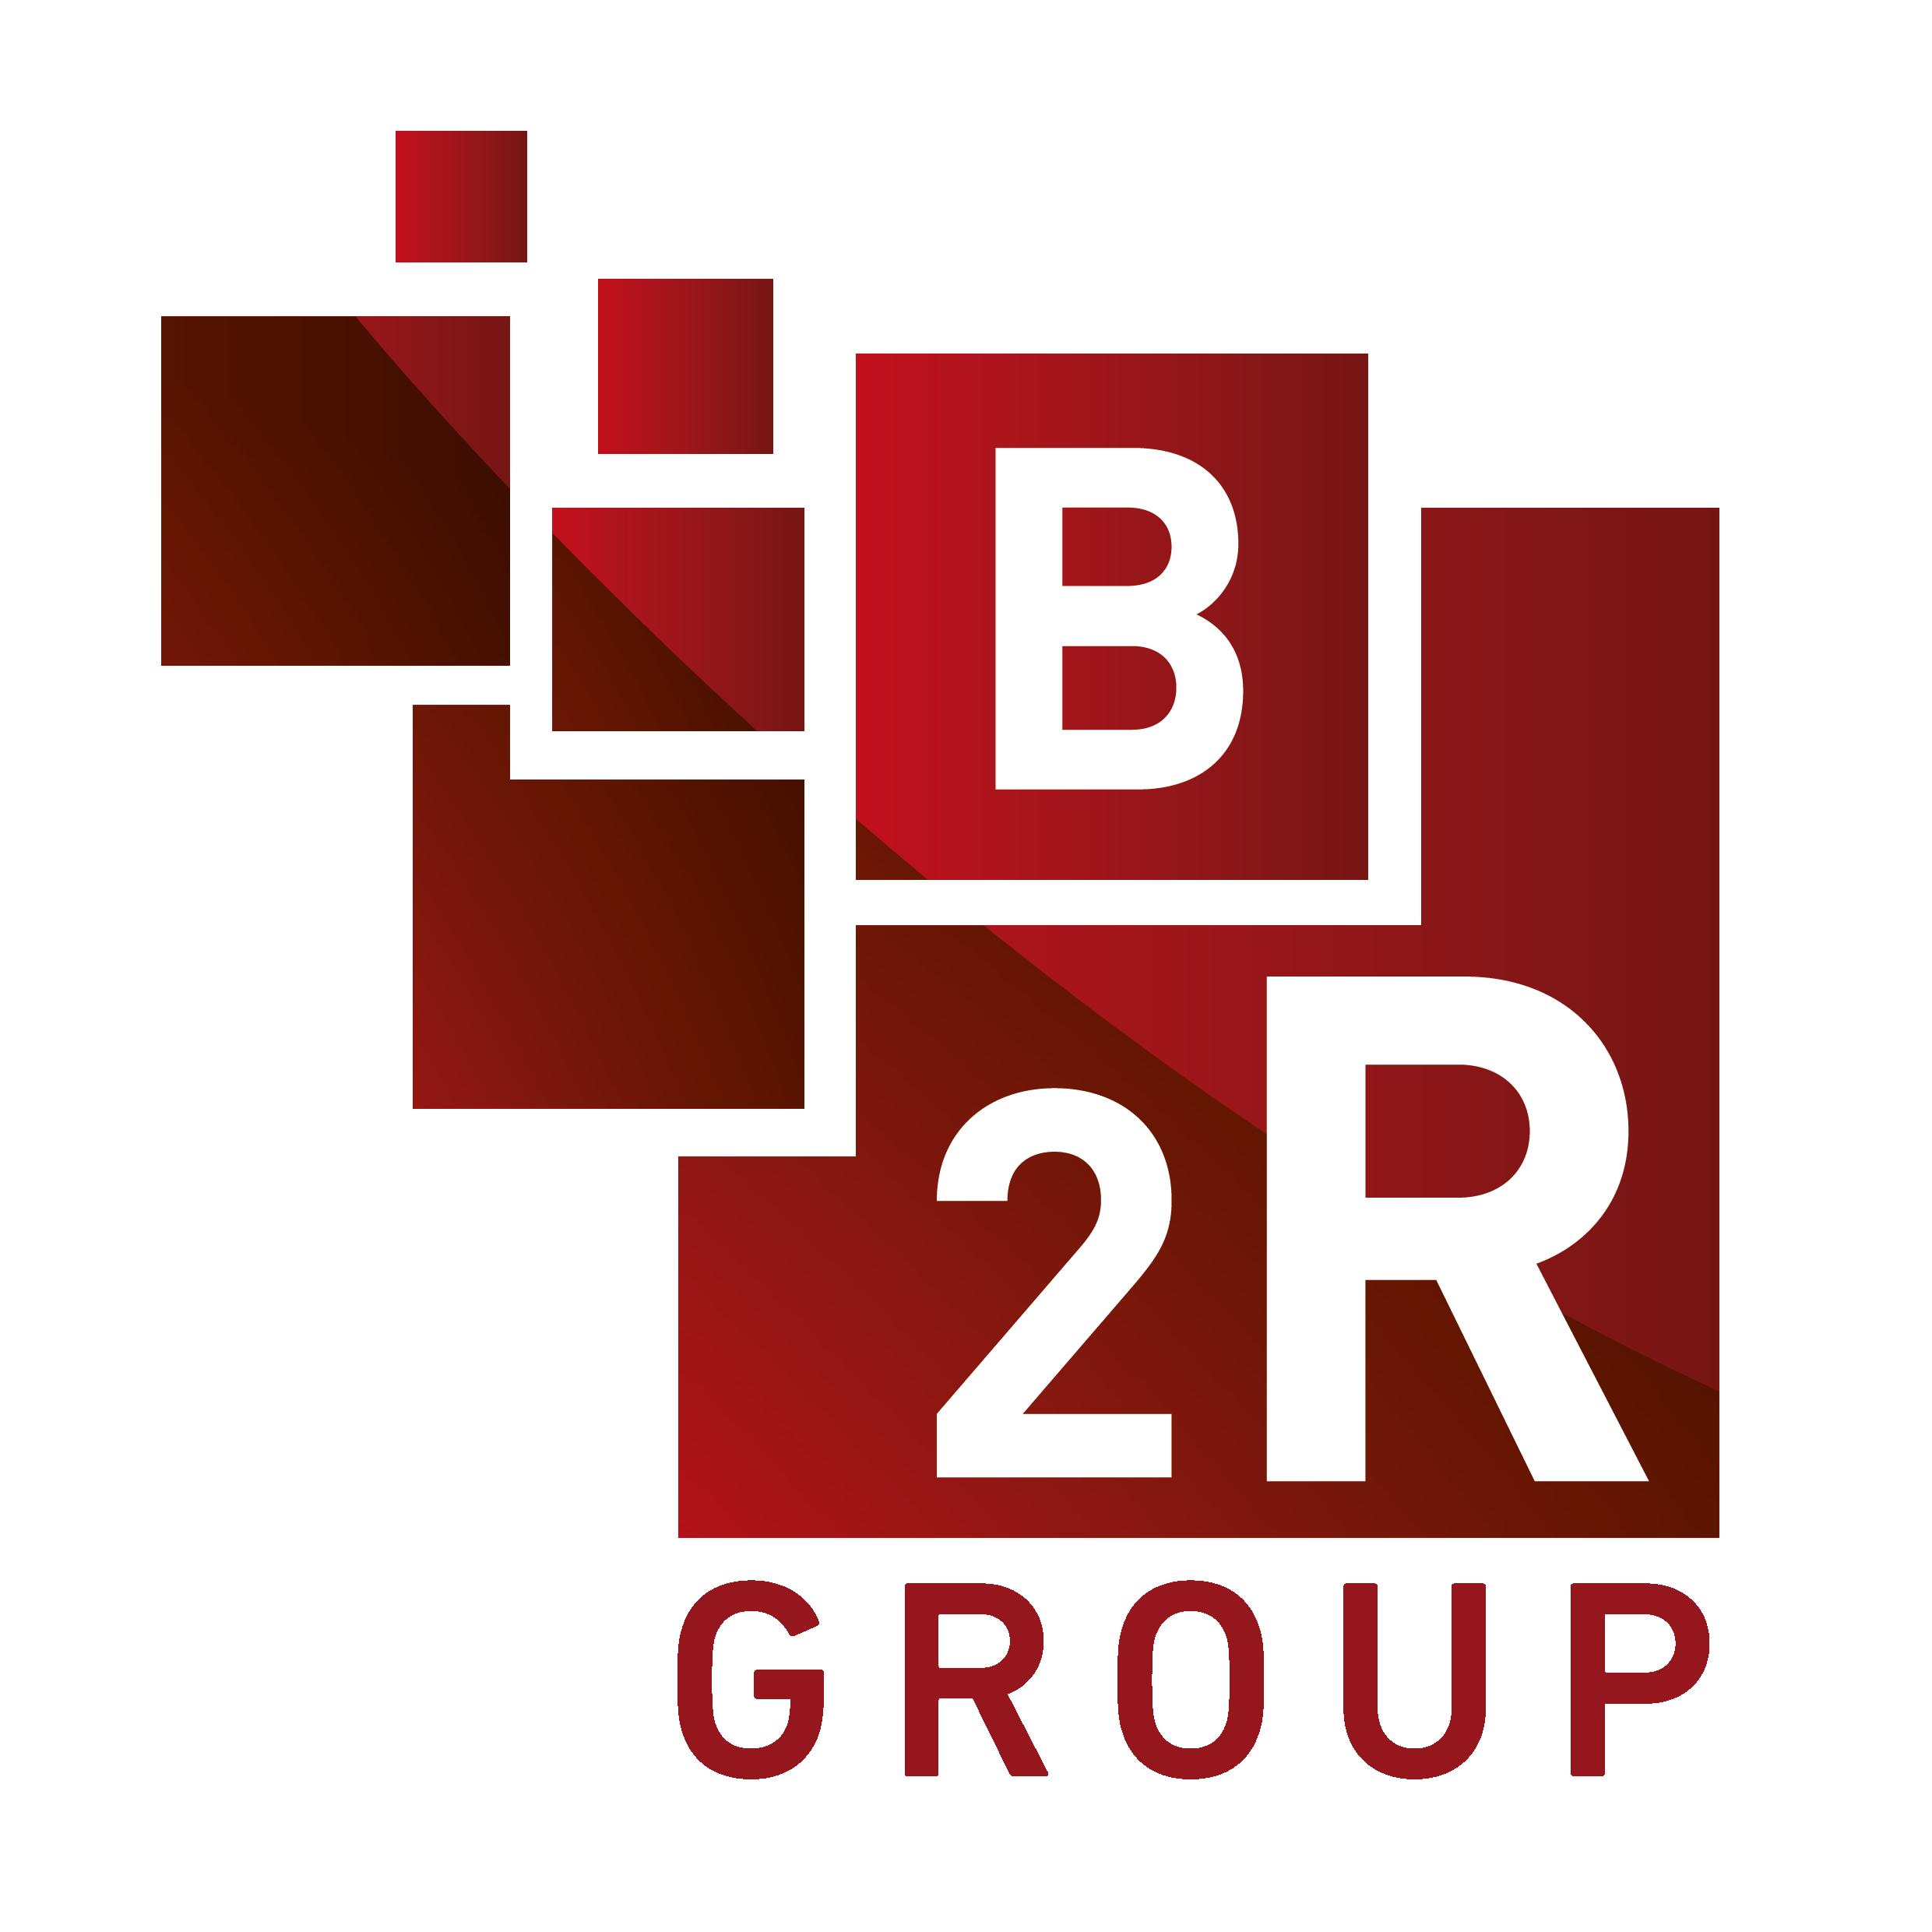 B2R Consulting : Cabinet de conseil en recrutement